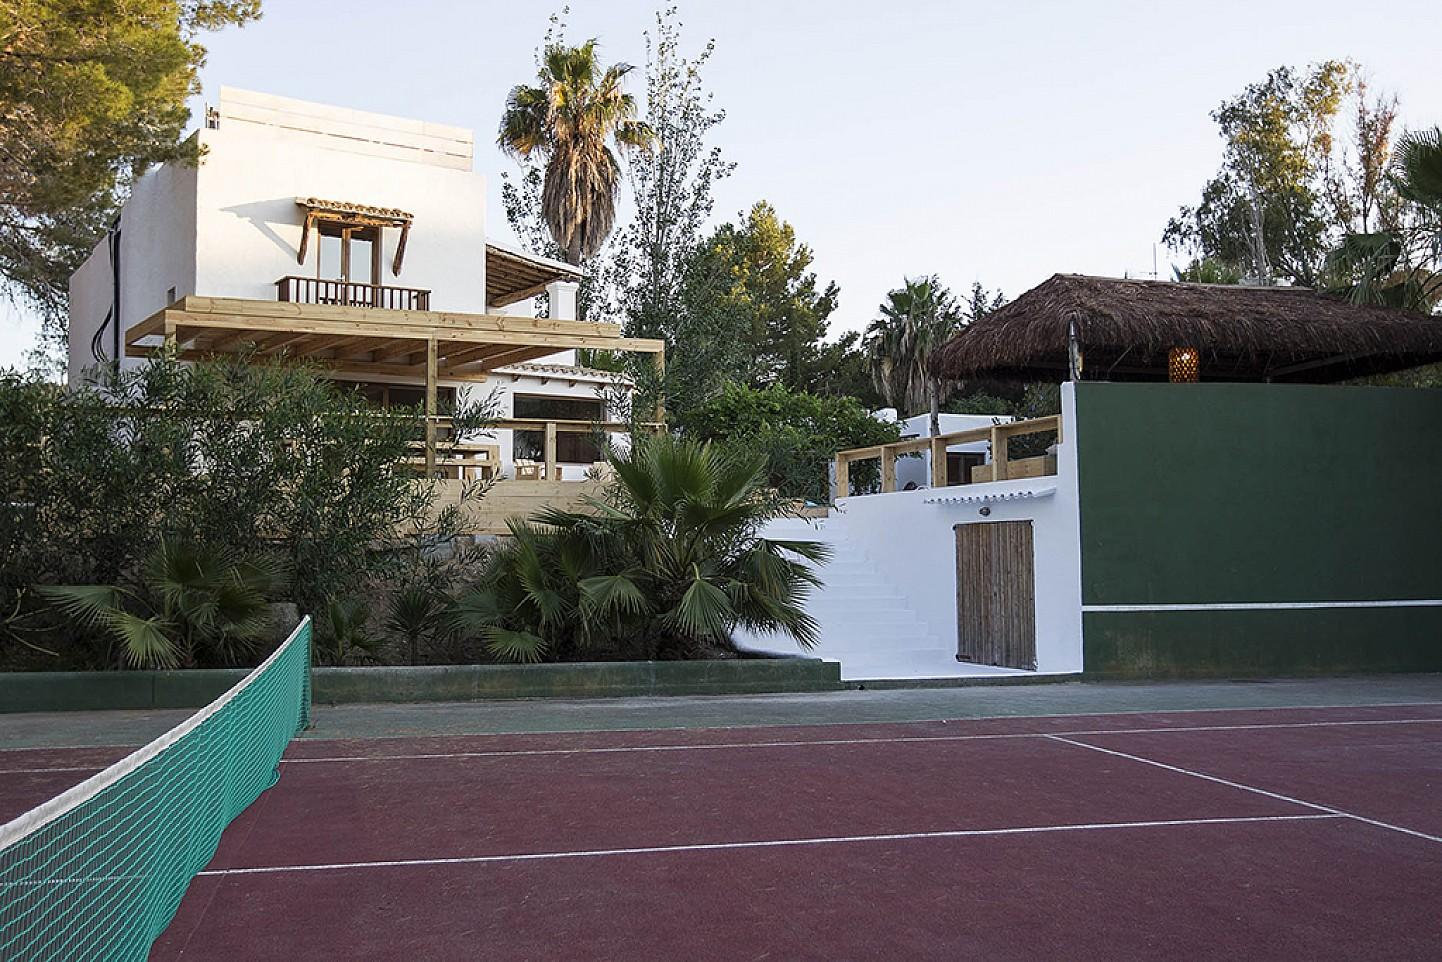 Fabulosa pista de tennis